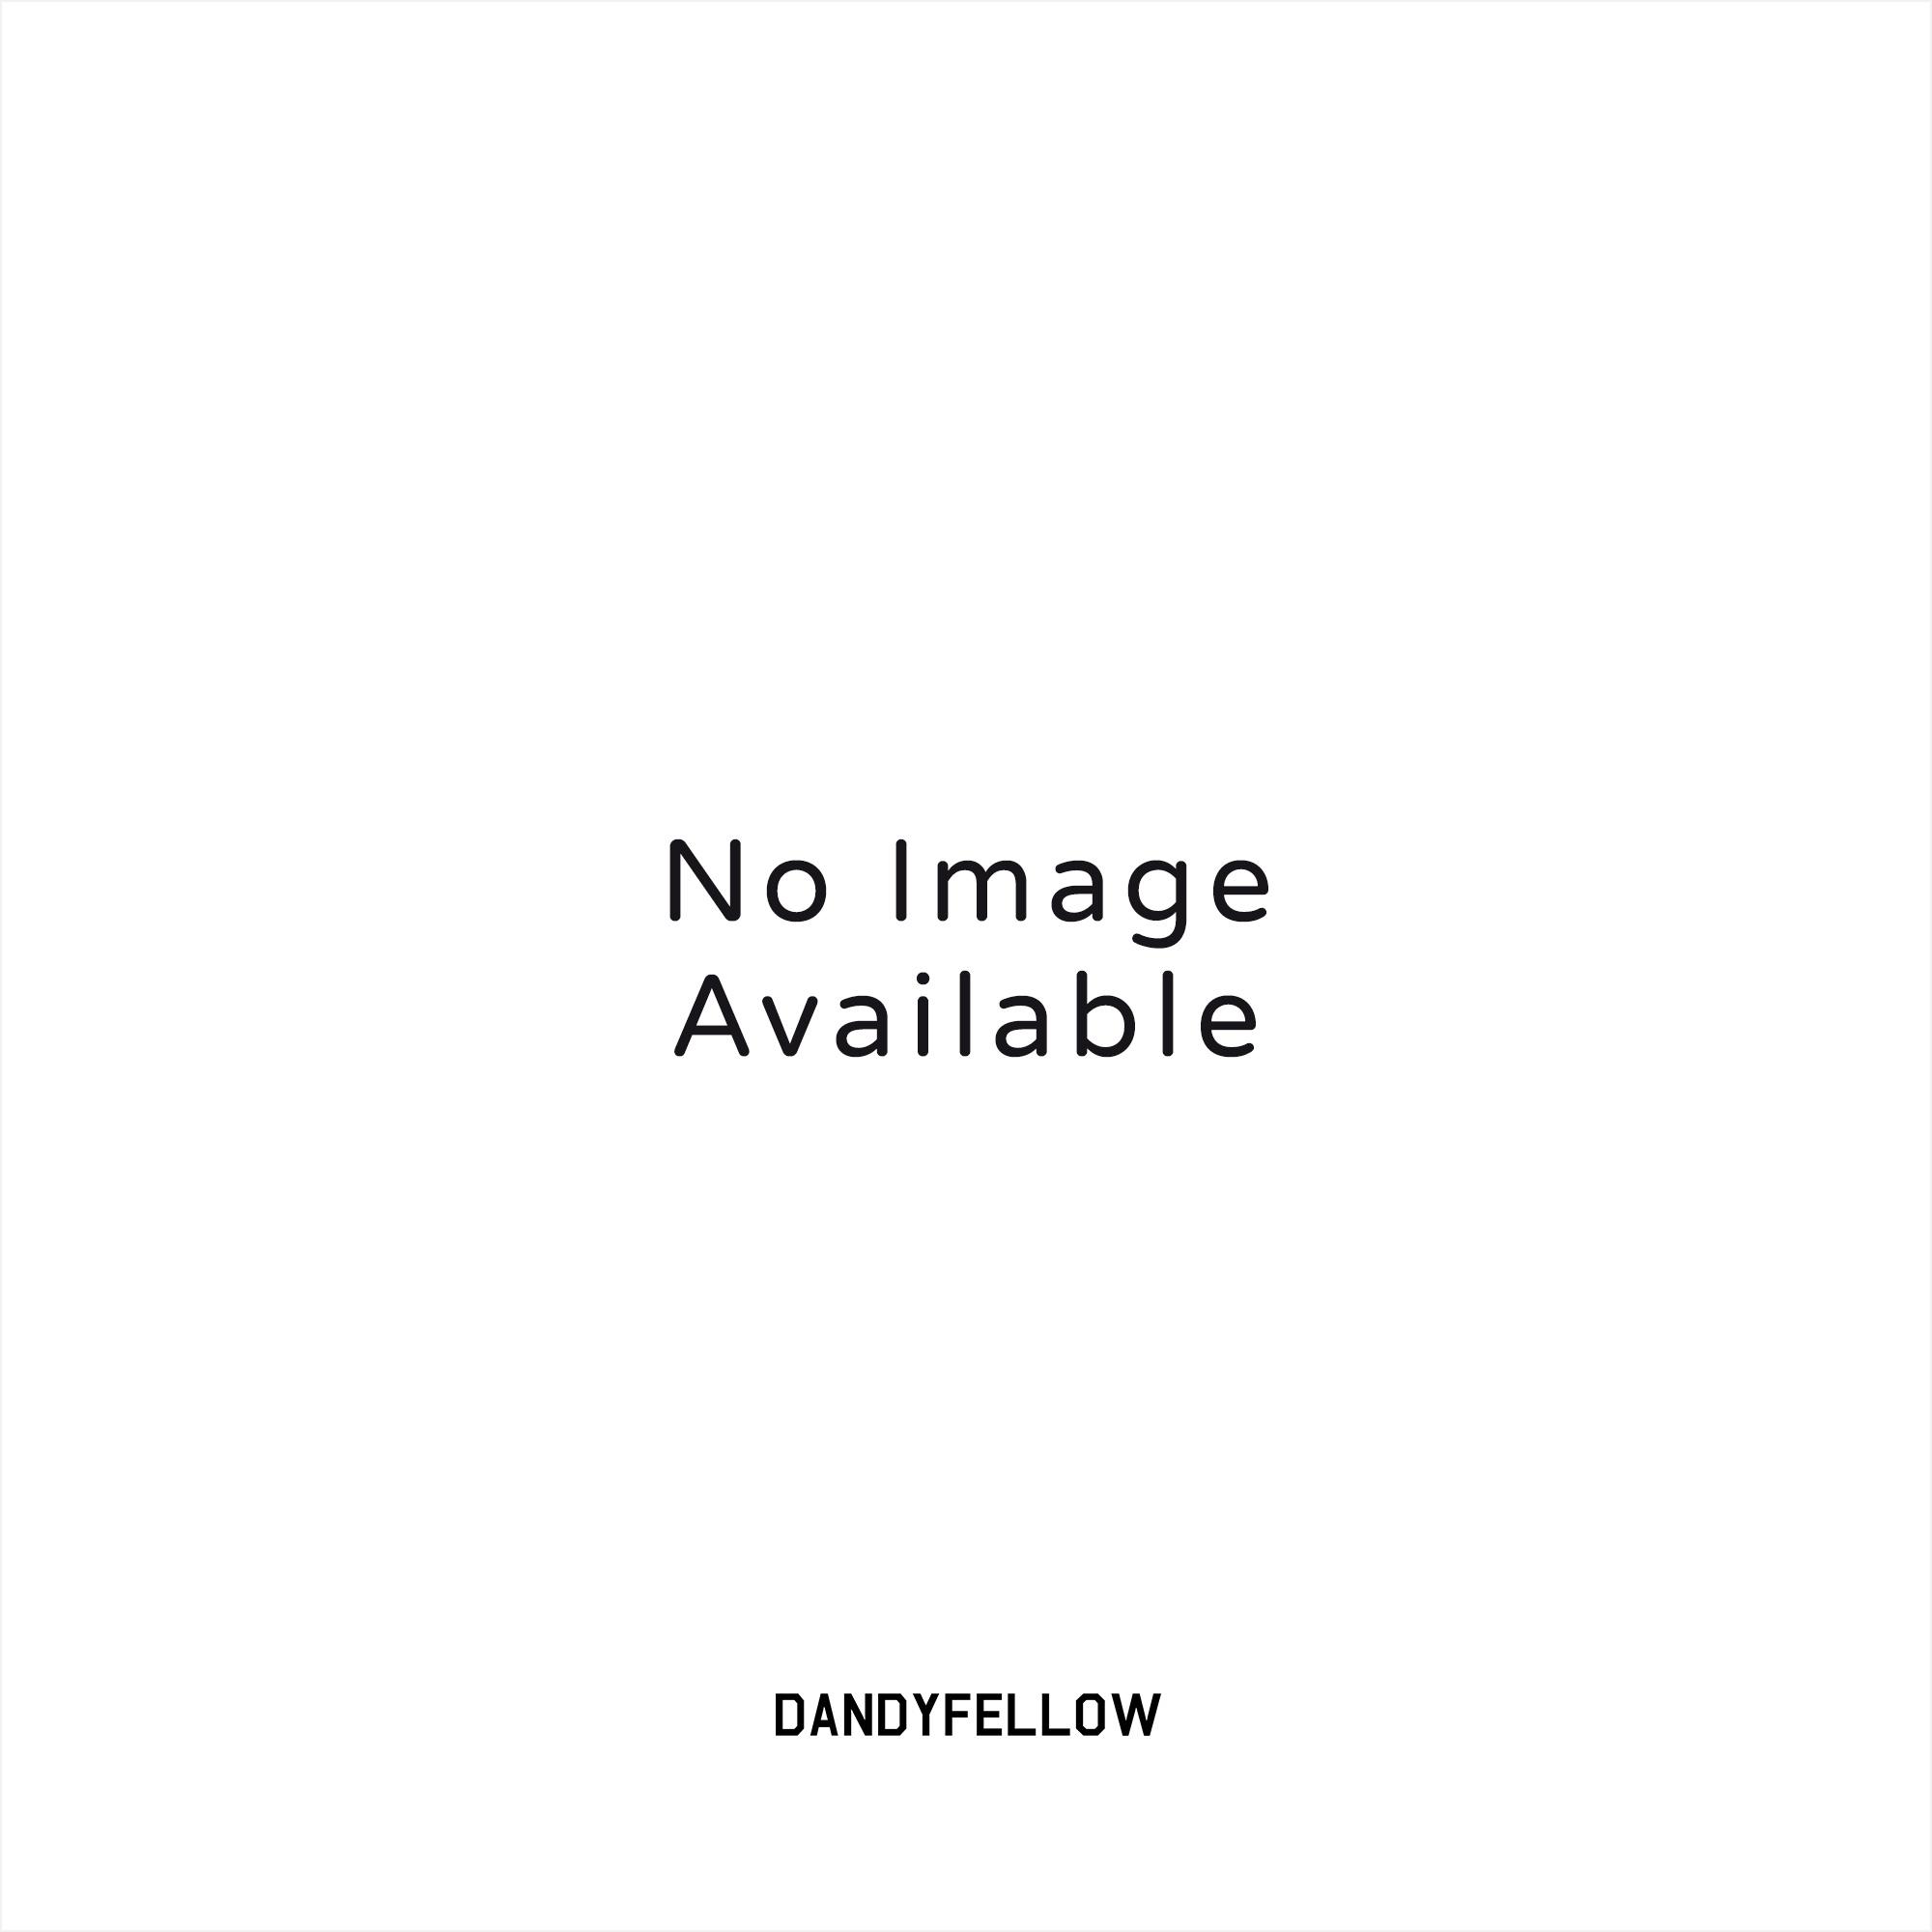 f4d3d3d3c05 Nike Womens M2K Tekno (Phantom   Summit White) at Dandy Fellow